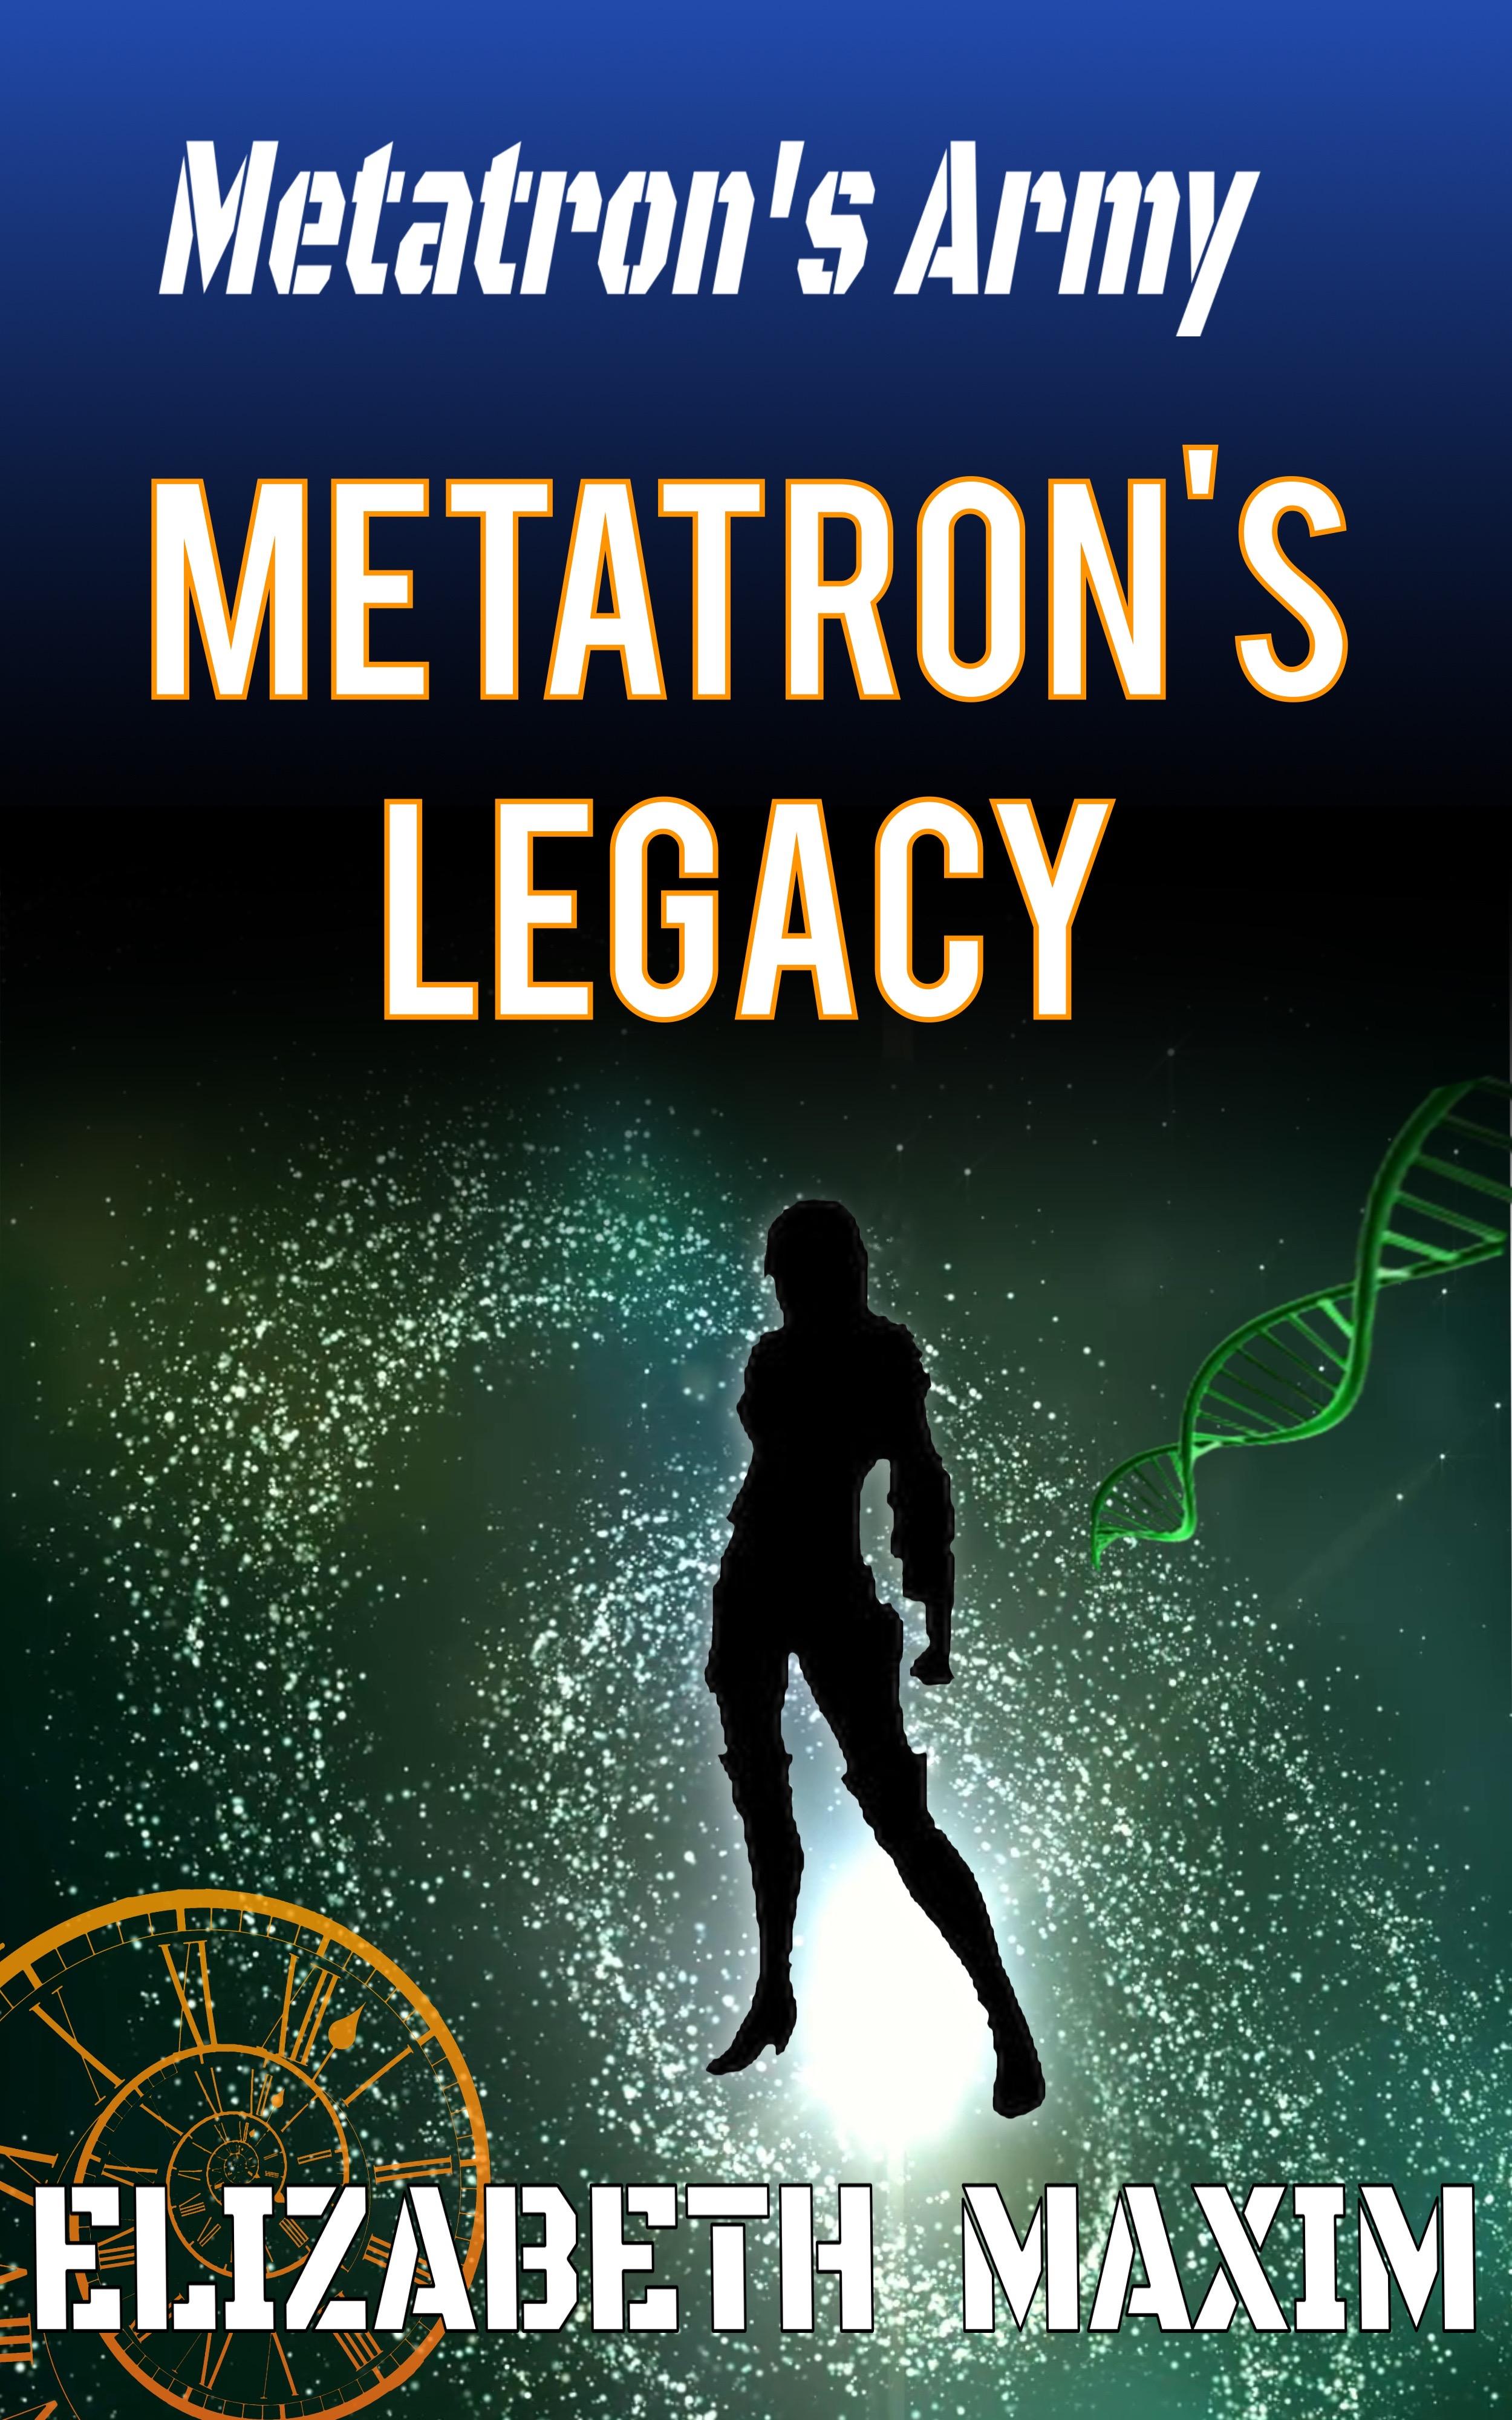 Metatron's Legacy cover.jpeg